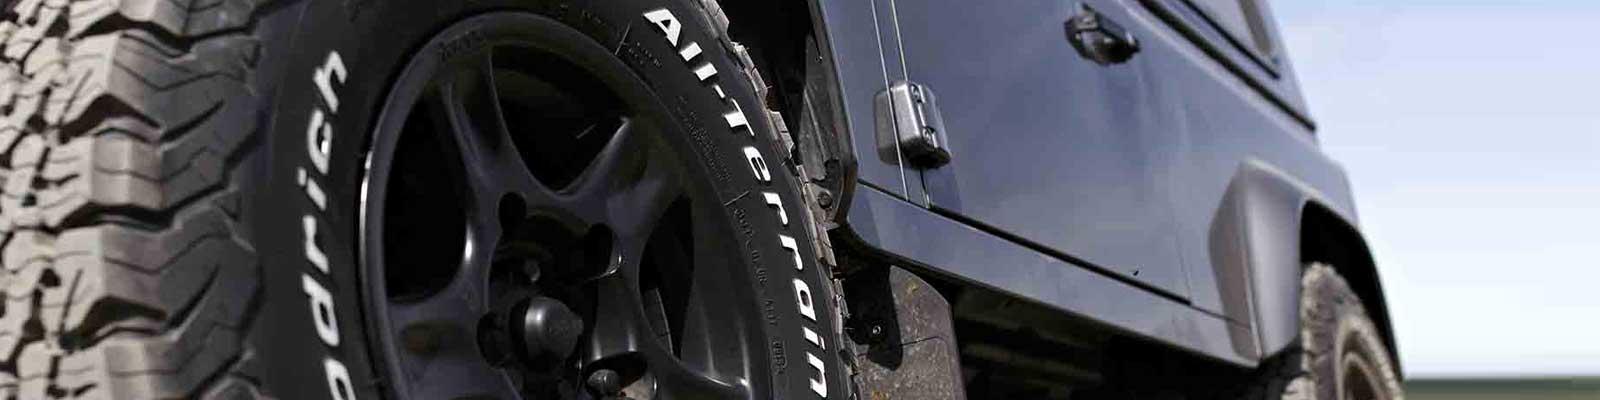 All Terrain 4x4 Tyres